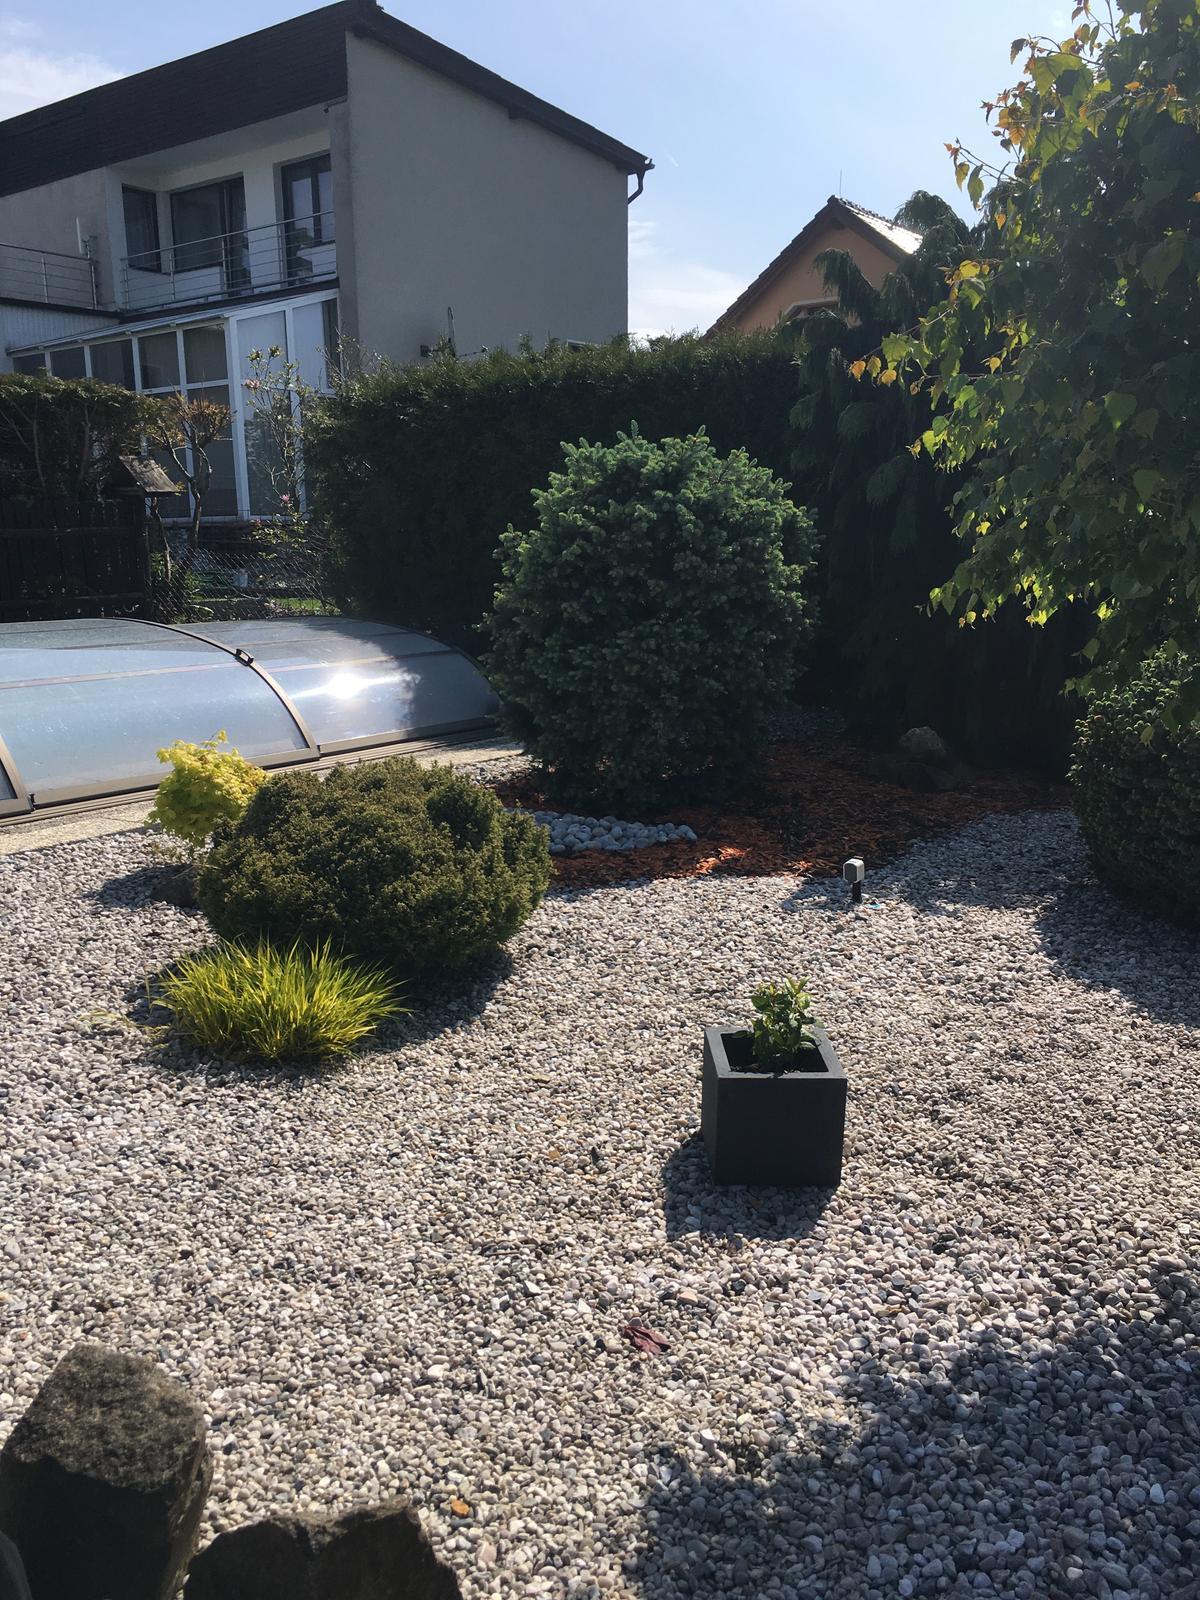 Zahrada 2019 - Obrázek č. 6